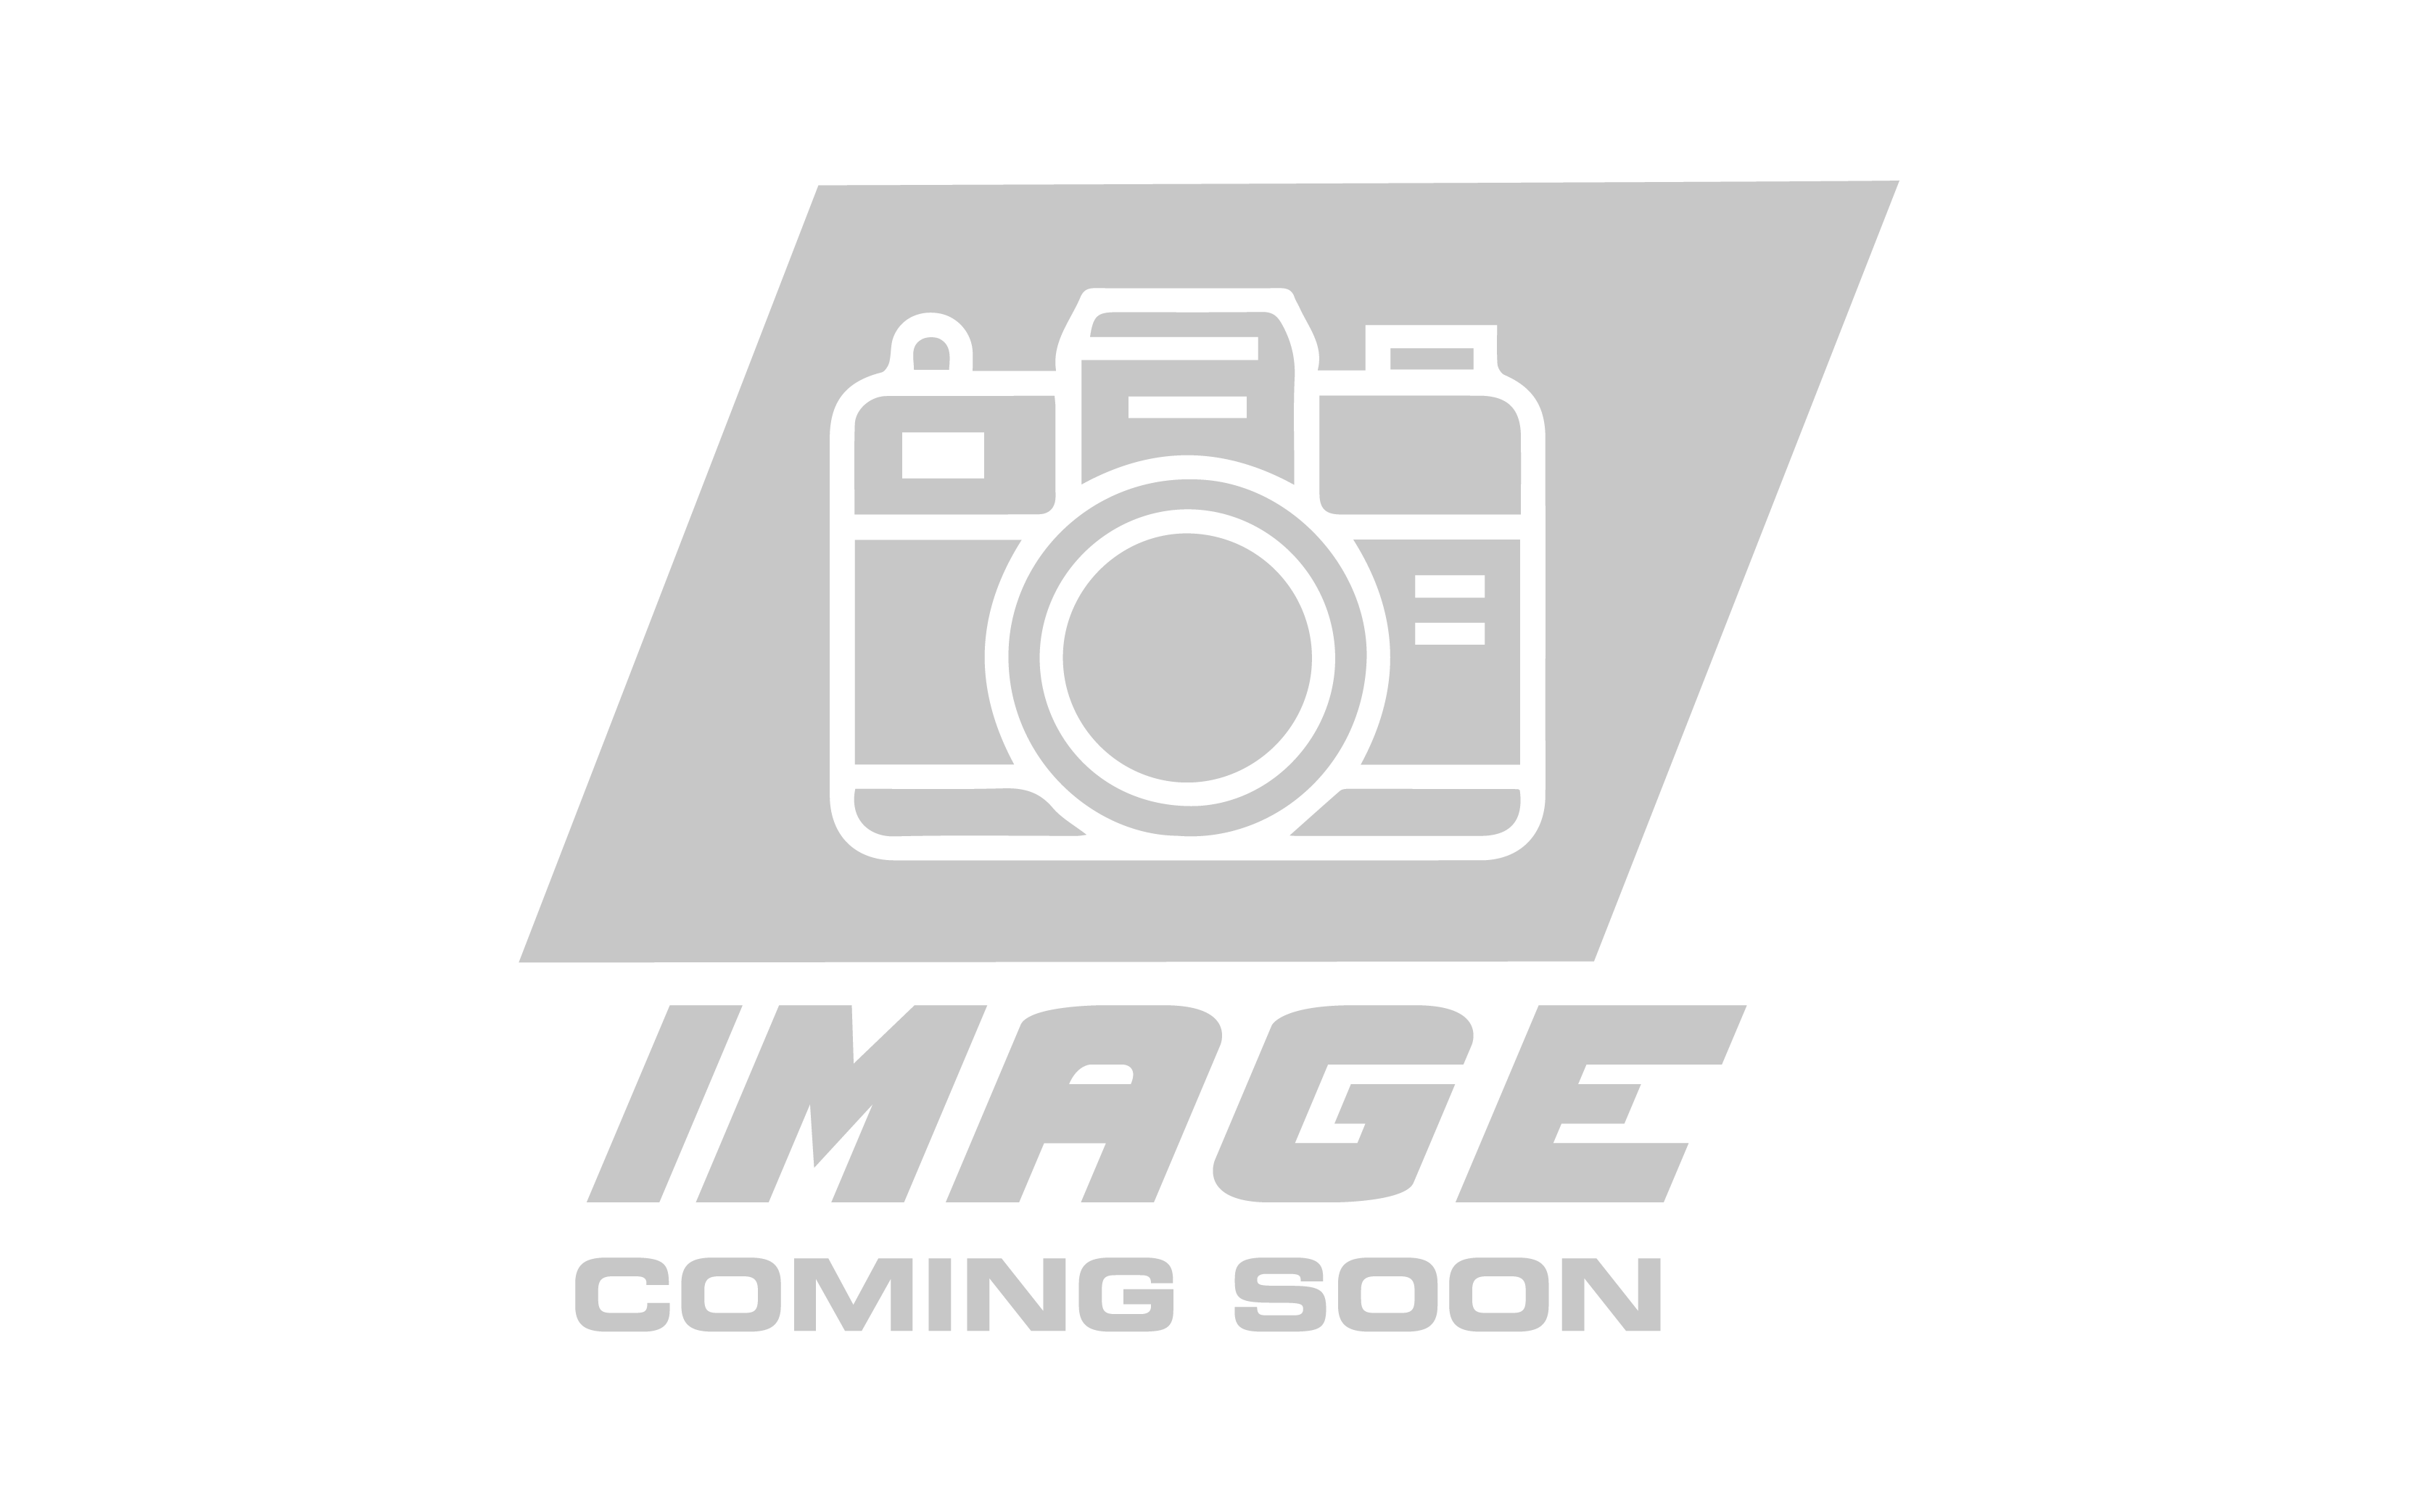 dodge_1500_3rd_gen_air_lift_loadlifter_5000_rear_kit